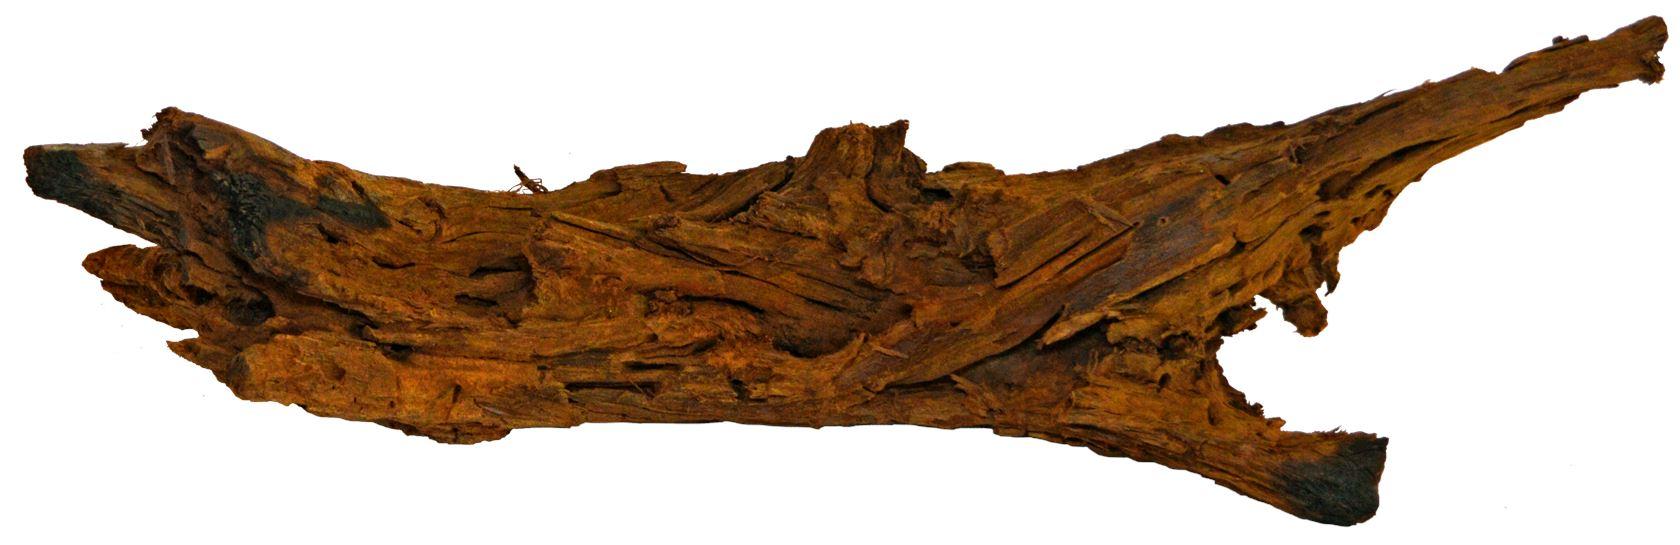 superfish-driftwood-s